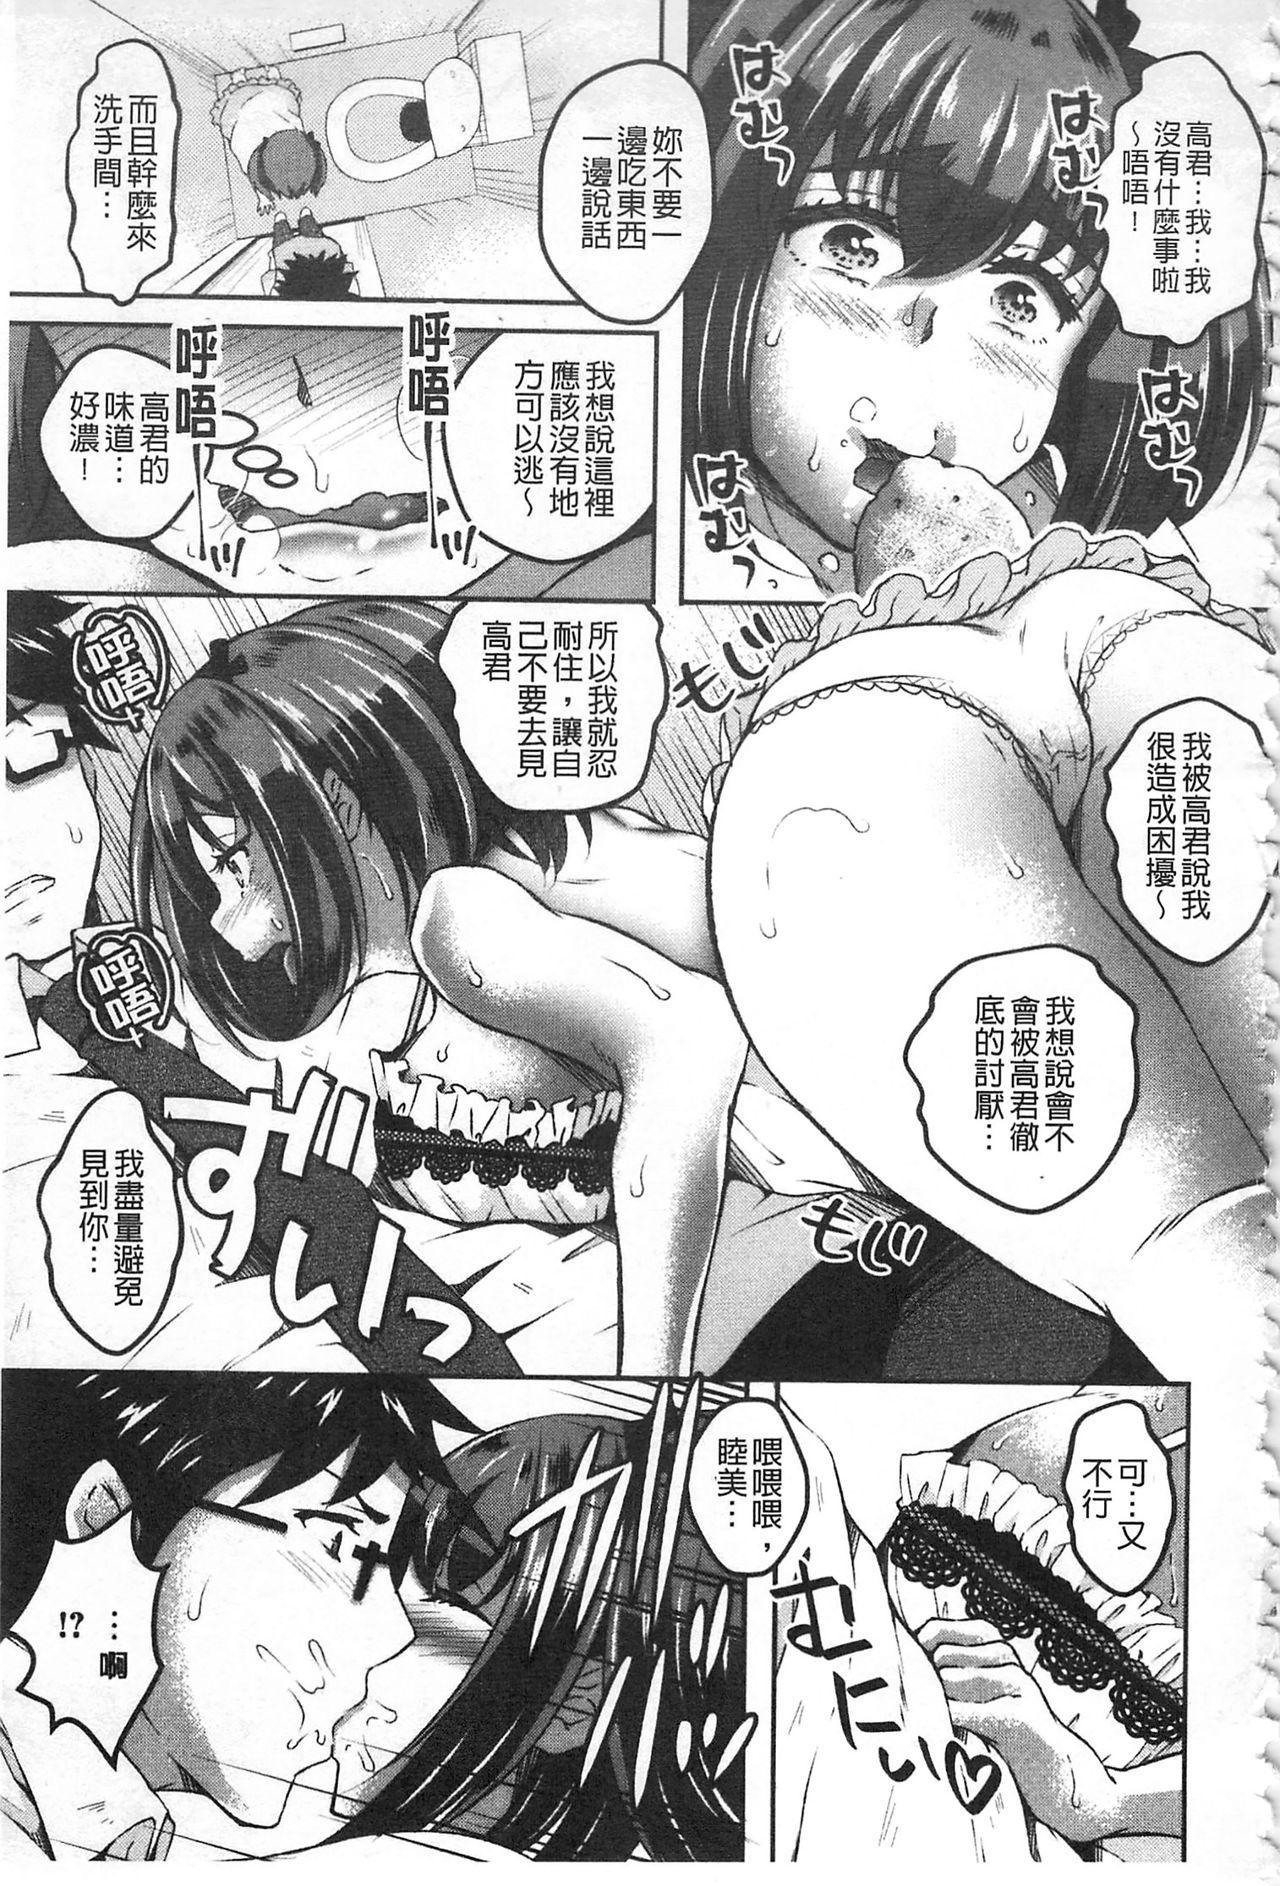 Kanjuku Otome no Odoshikata | 姦熟乙女的脅迫法 106